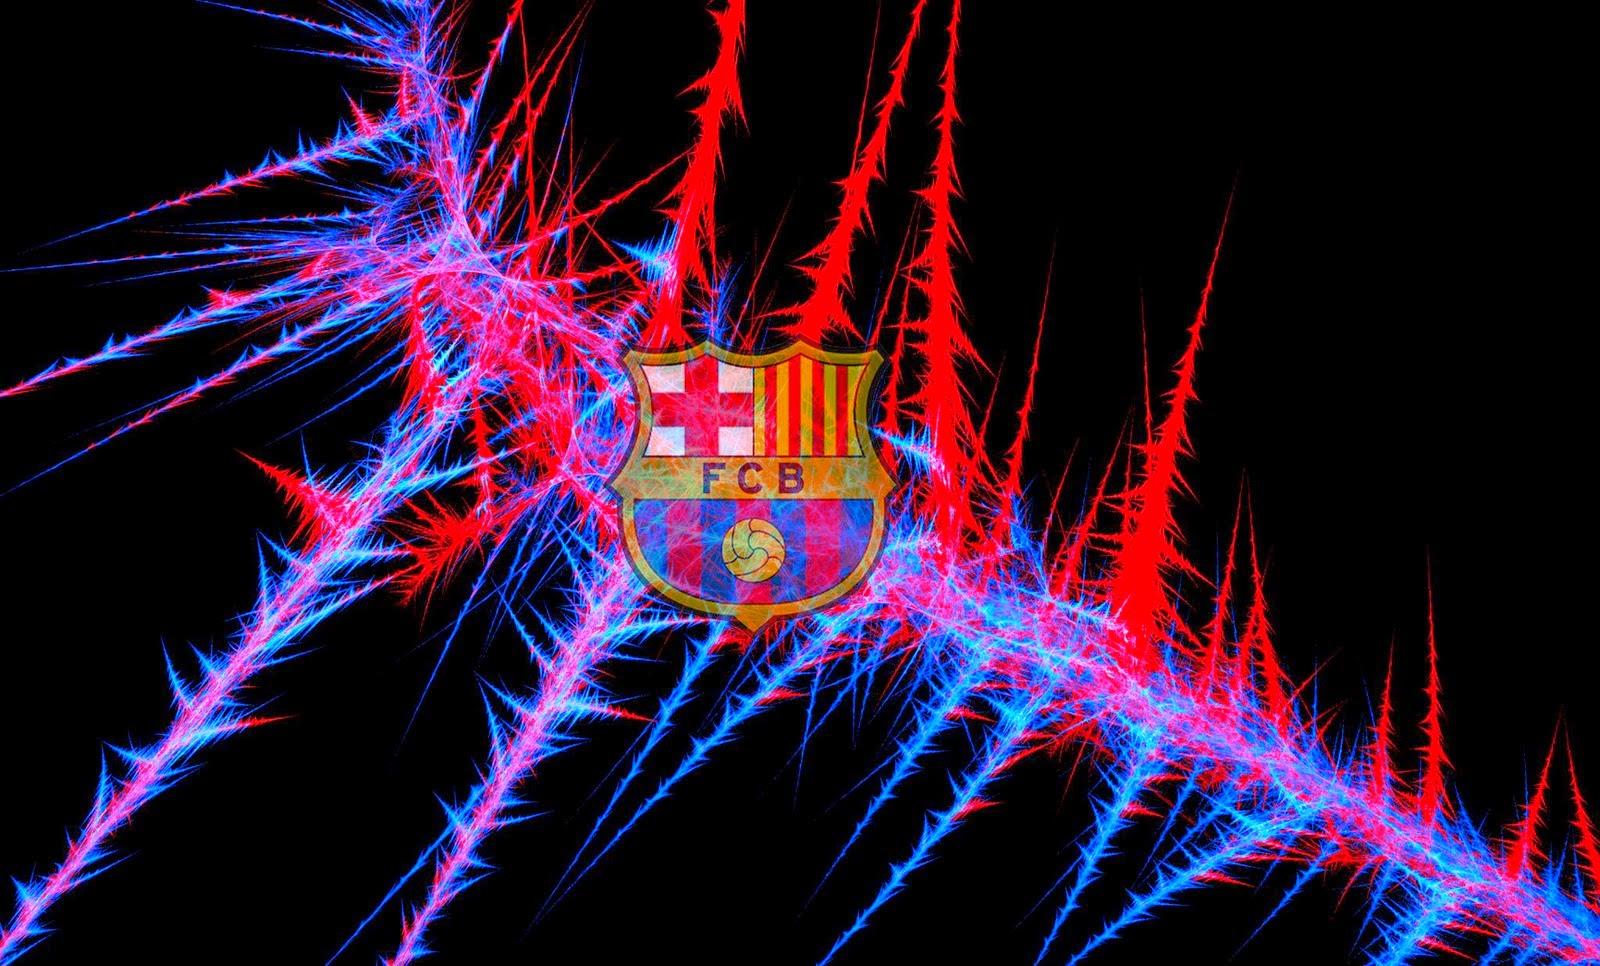 fc barcelona wallpapers iphone 6